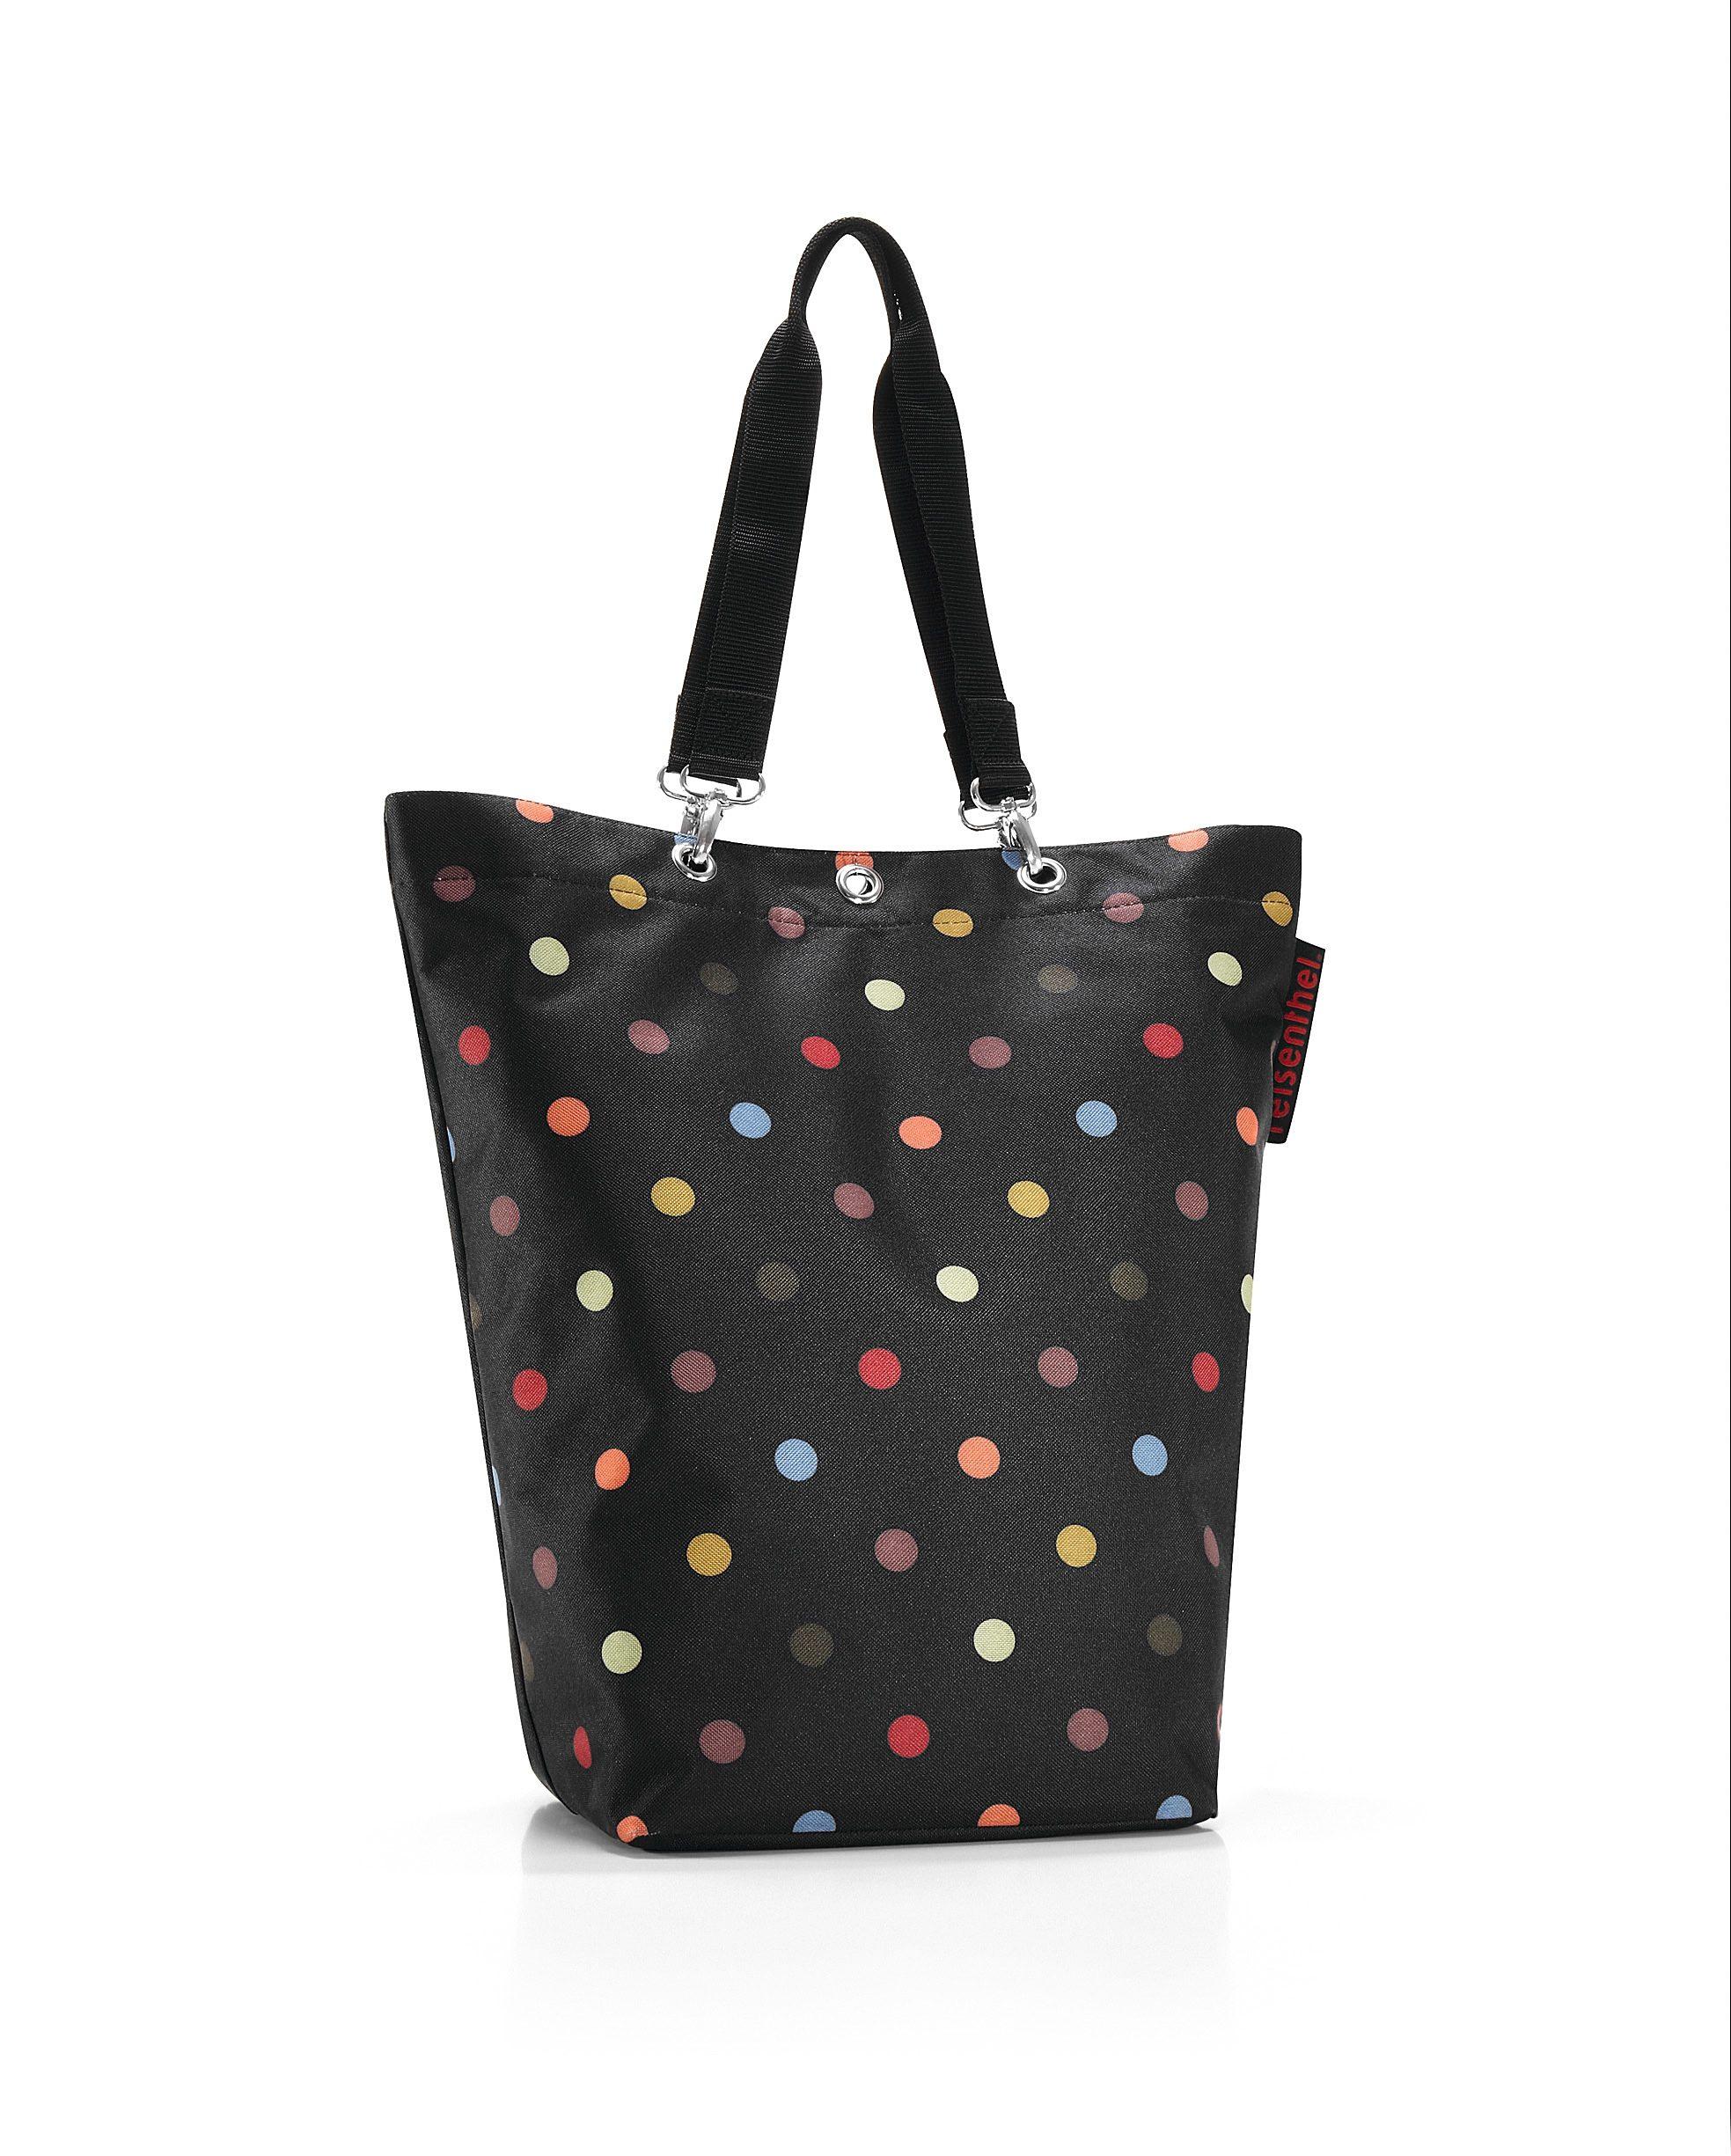 REISENTHEL® Cityshopper dots